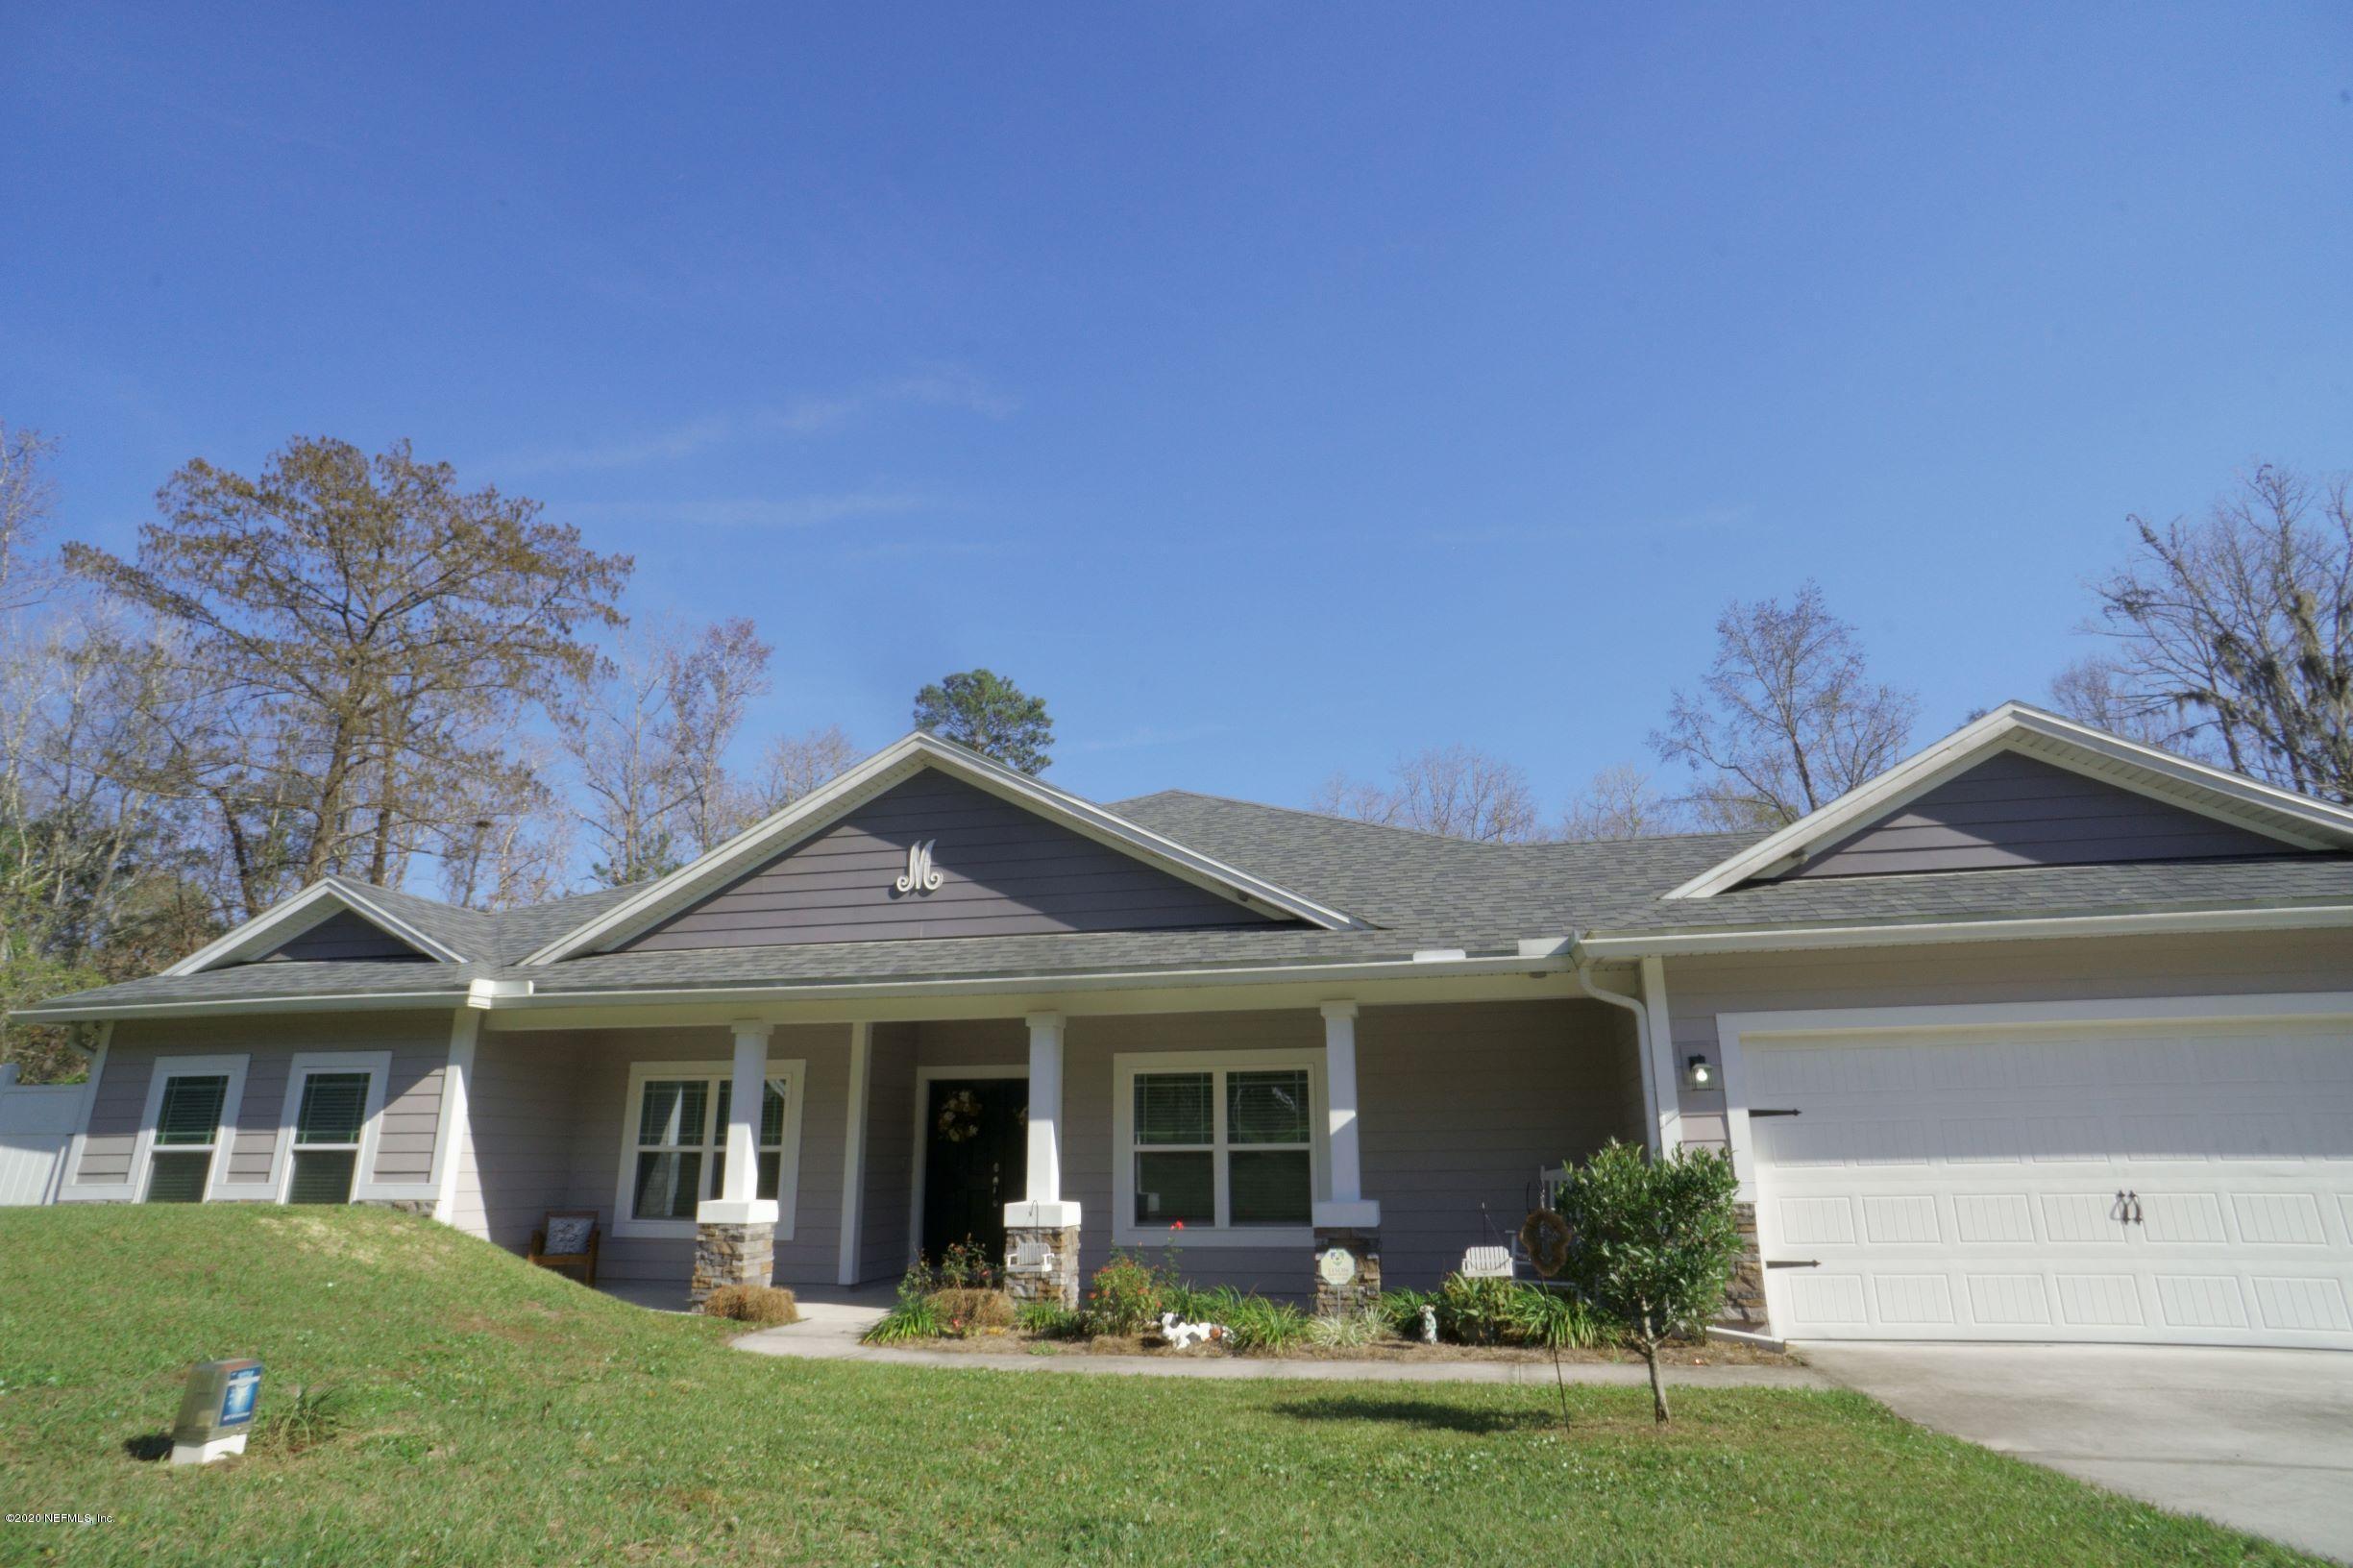 2779 PERIWINKLE, MIDDLEBURG, FLORIDA 32068, 4 Bedrooms Bedrooms, ,3 BathroomsBathrooms,Residential,For sale,PERIWINKLE,1032115